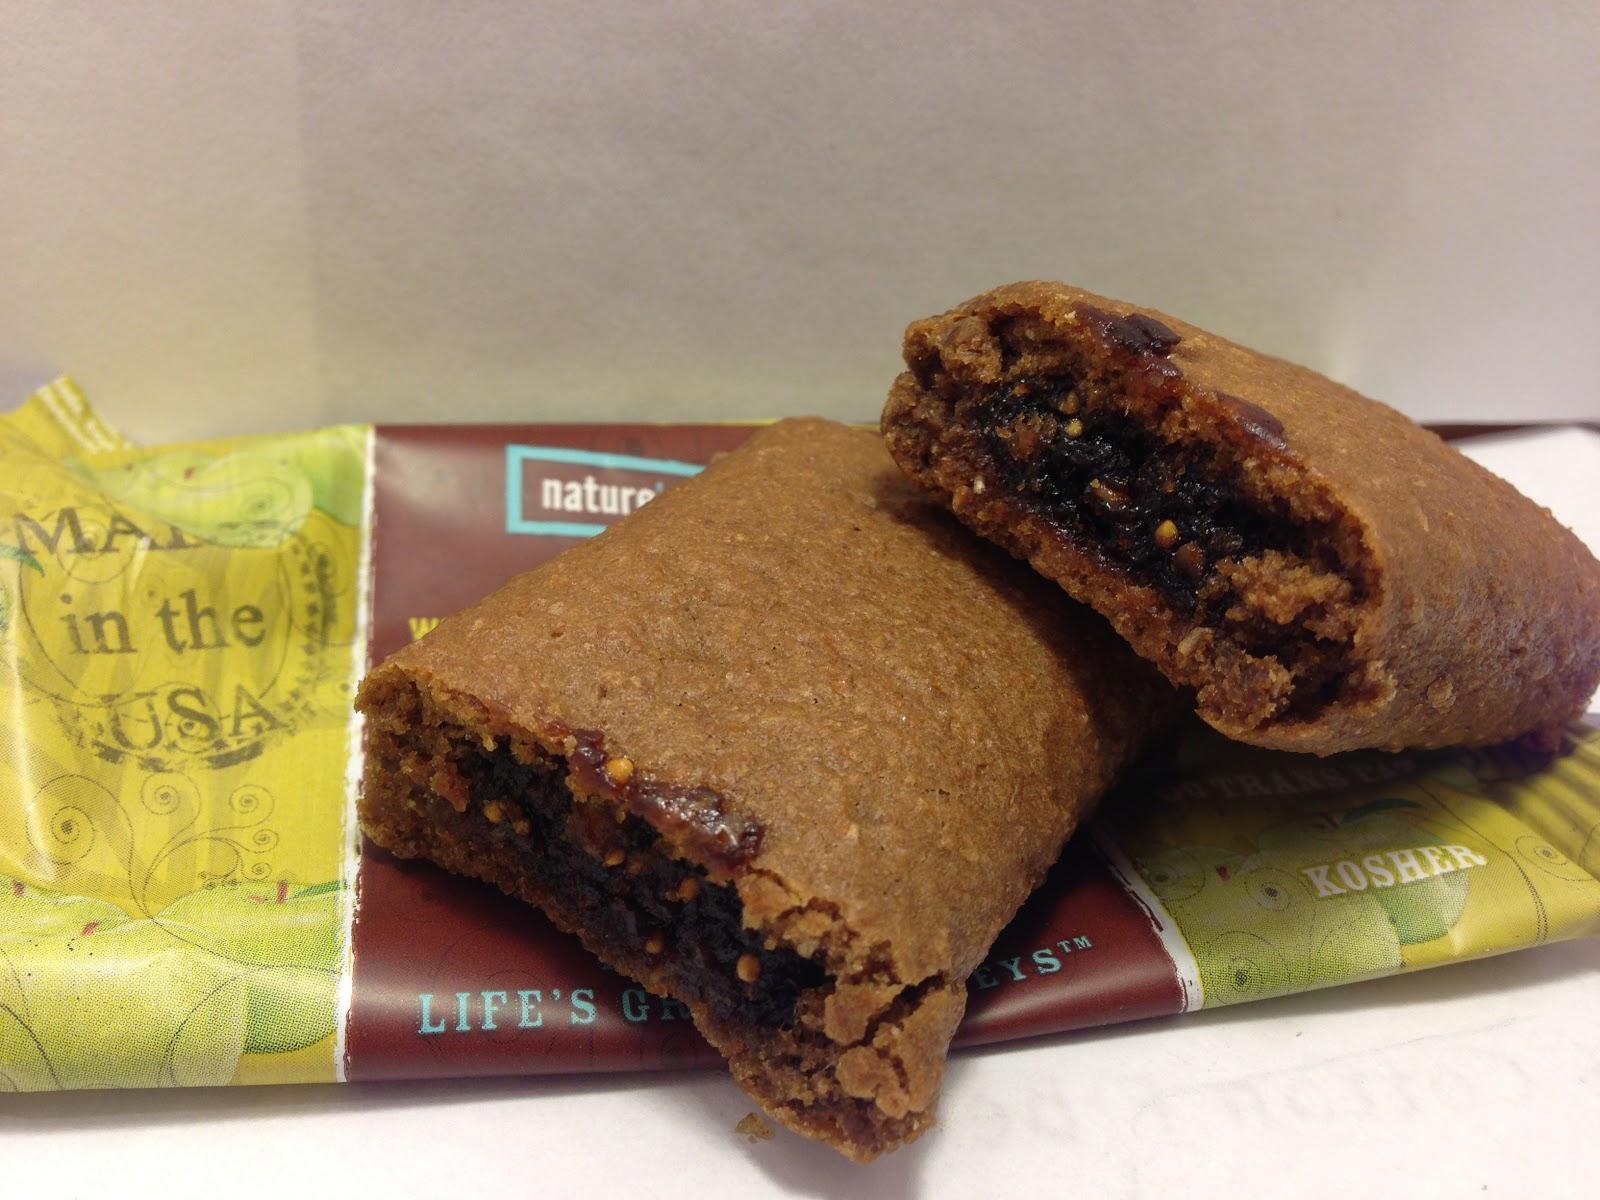 ... : Nature's Bakery Stone Ground Whole Wheat Apple Cinnamon Fig Bar